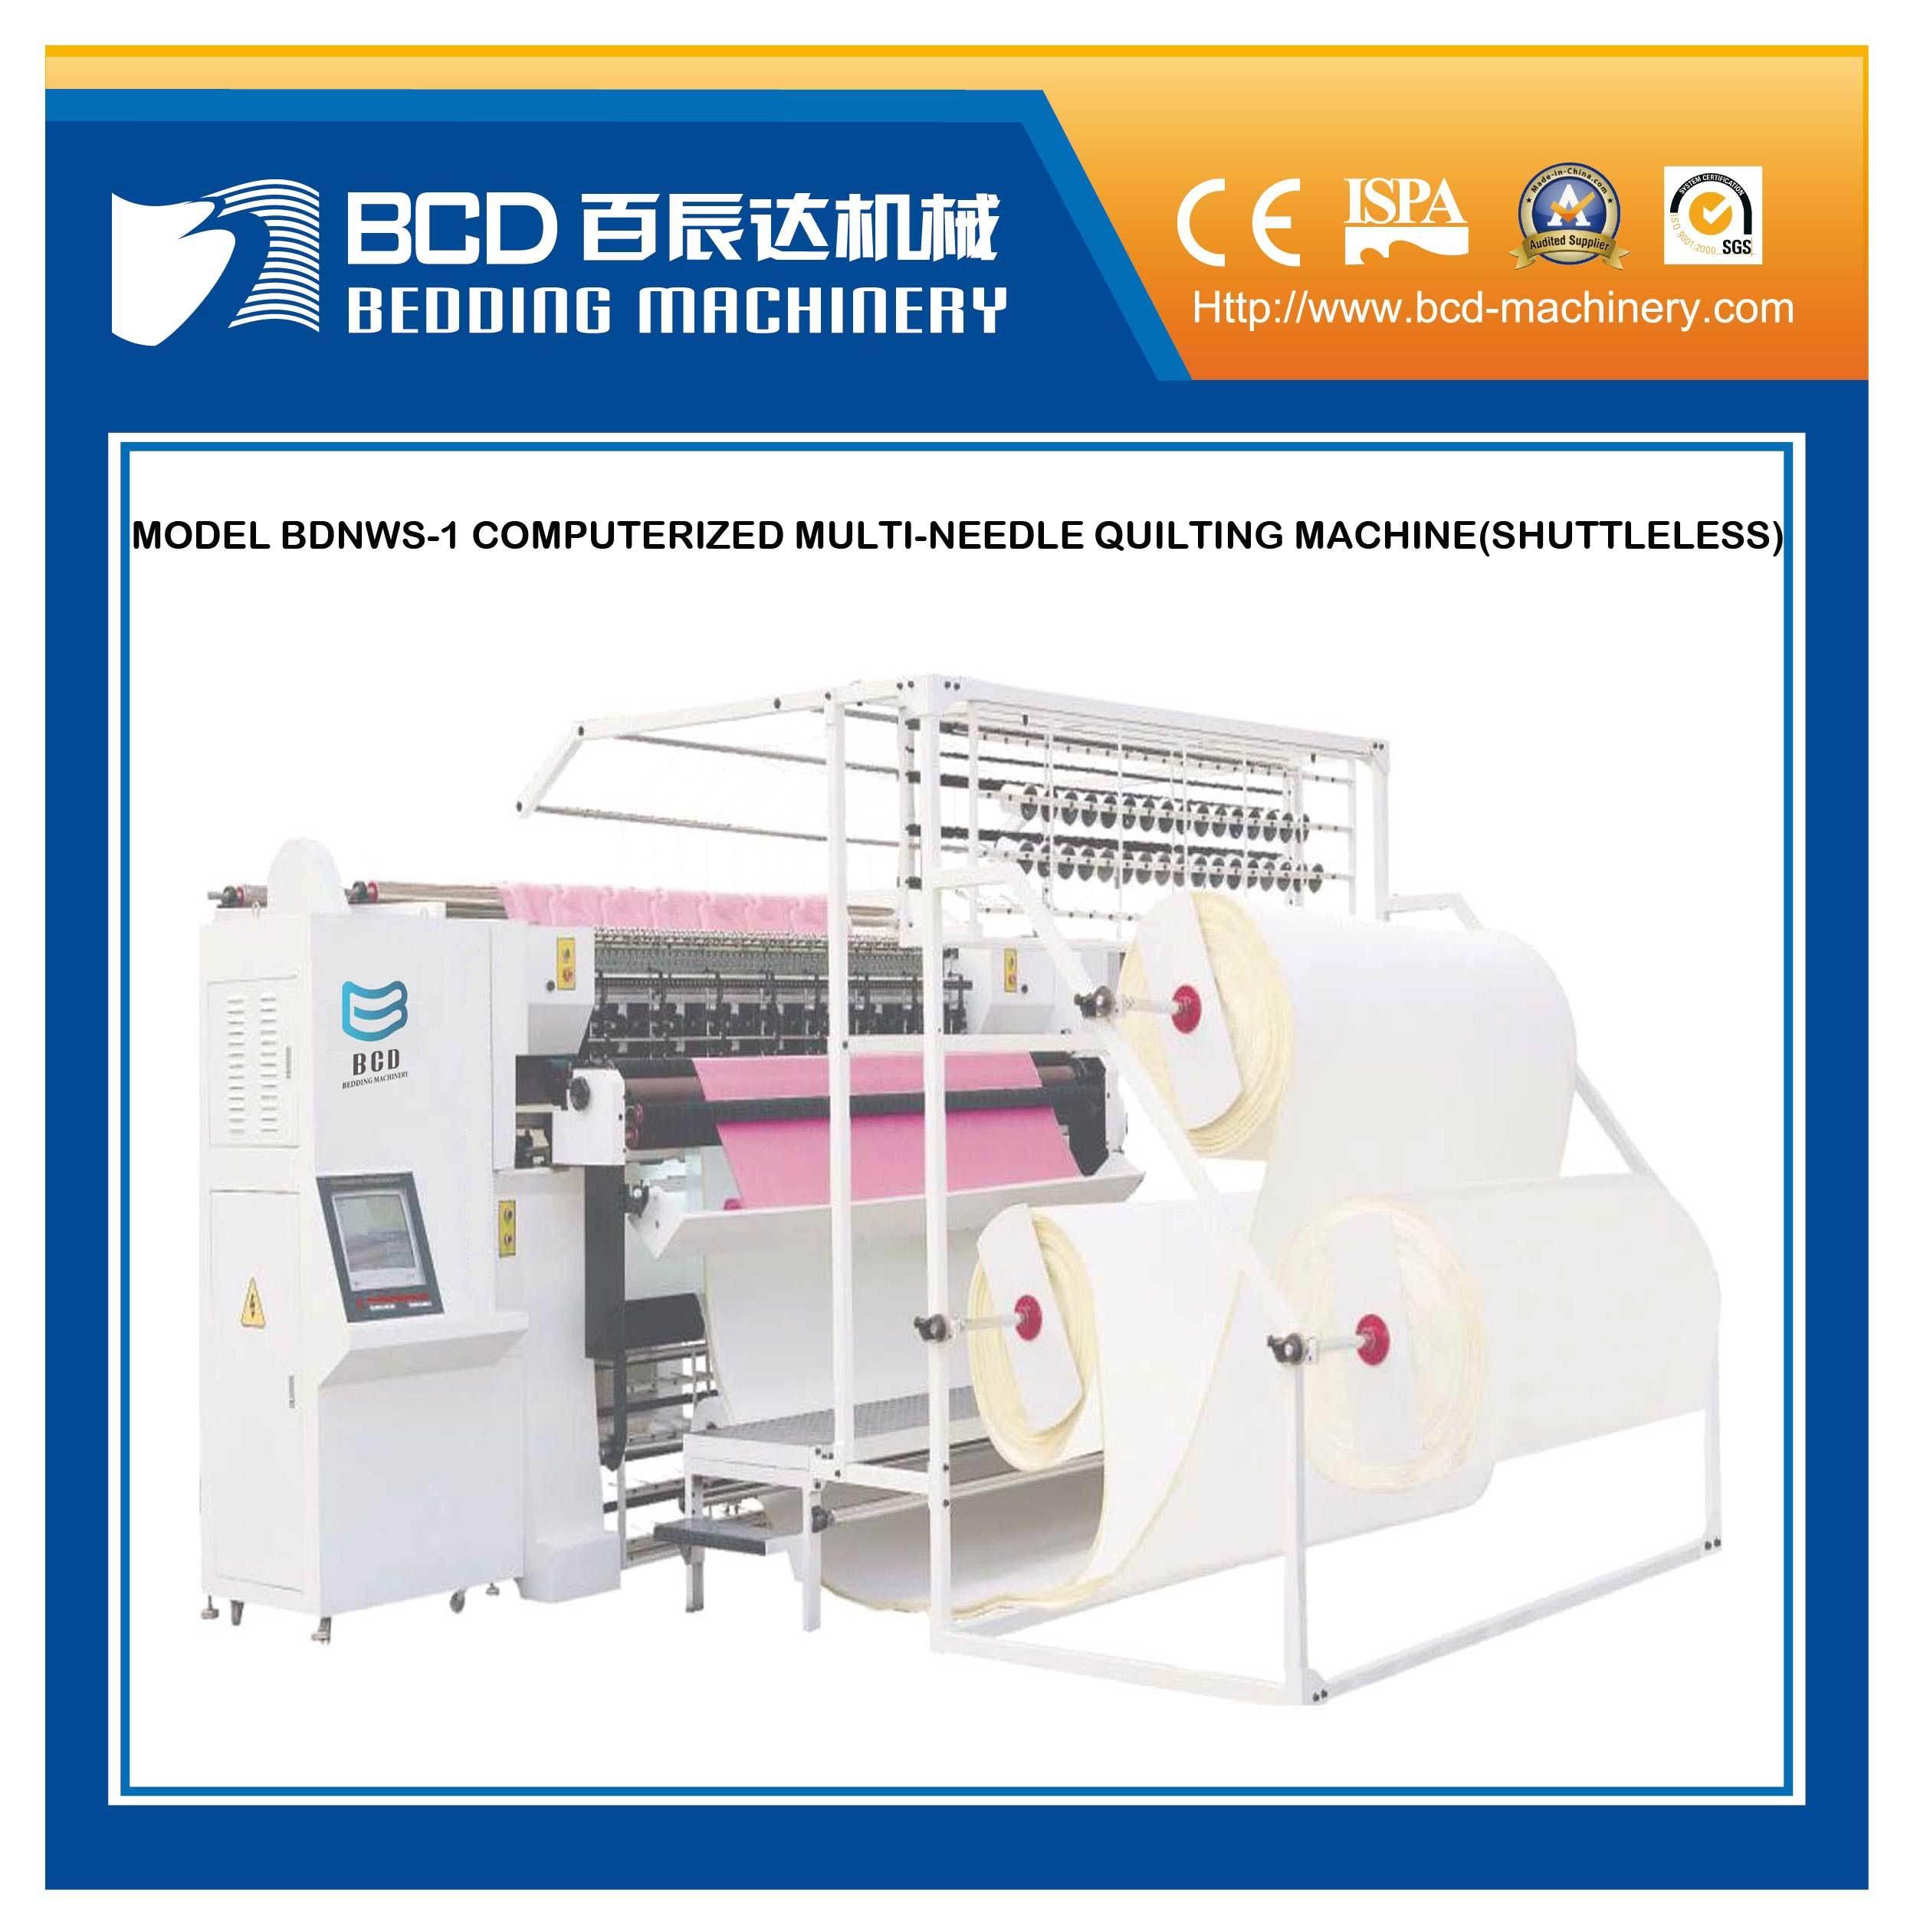 Computerized Multi-Needle Quilting Machine (BDNWS-1 Shuttleless)